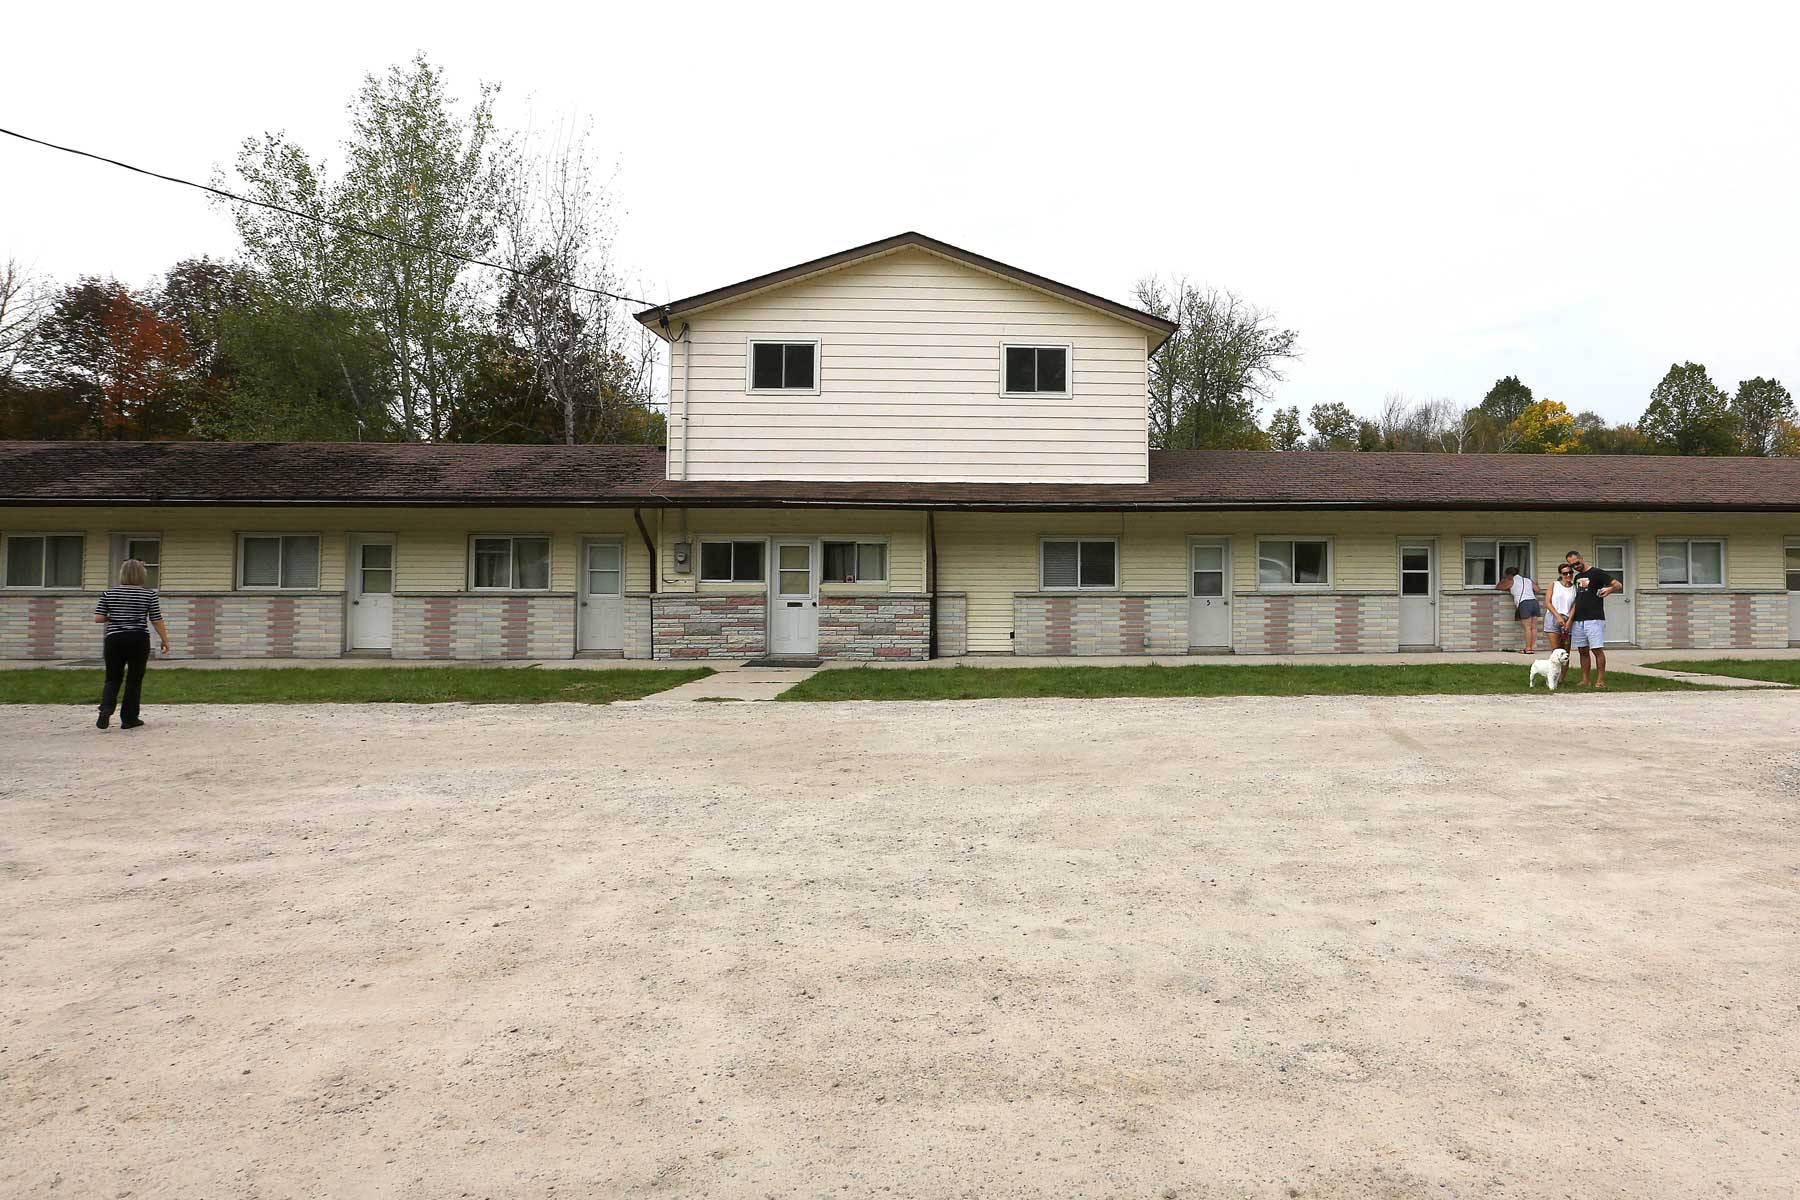 rosebud-motel-ontario-schitts-creek-ROSEBUD1020